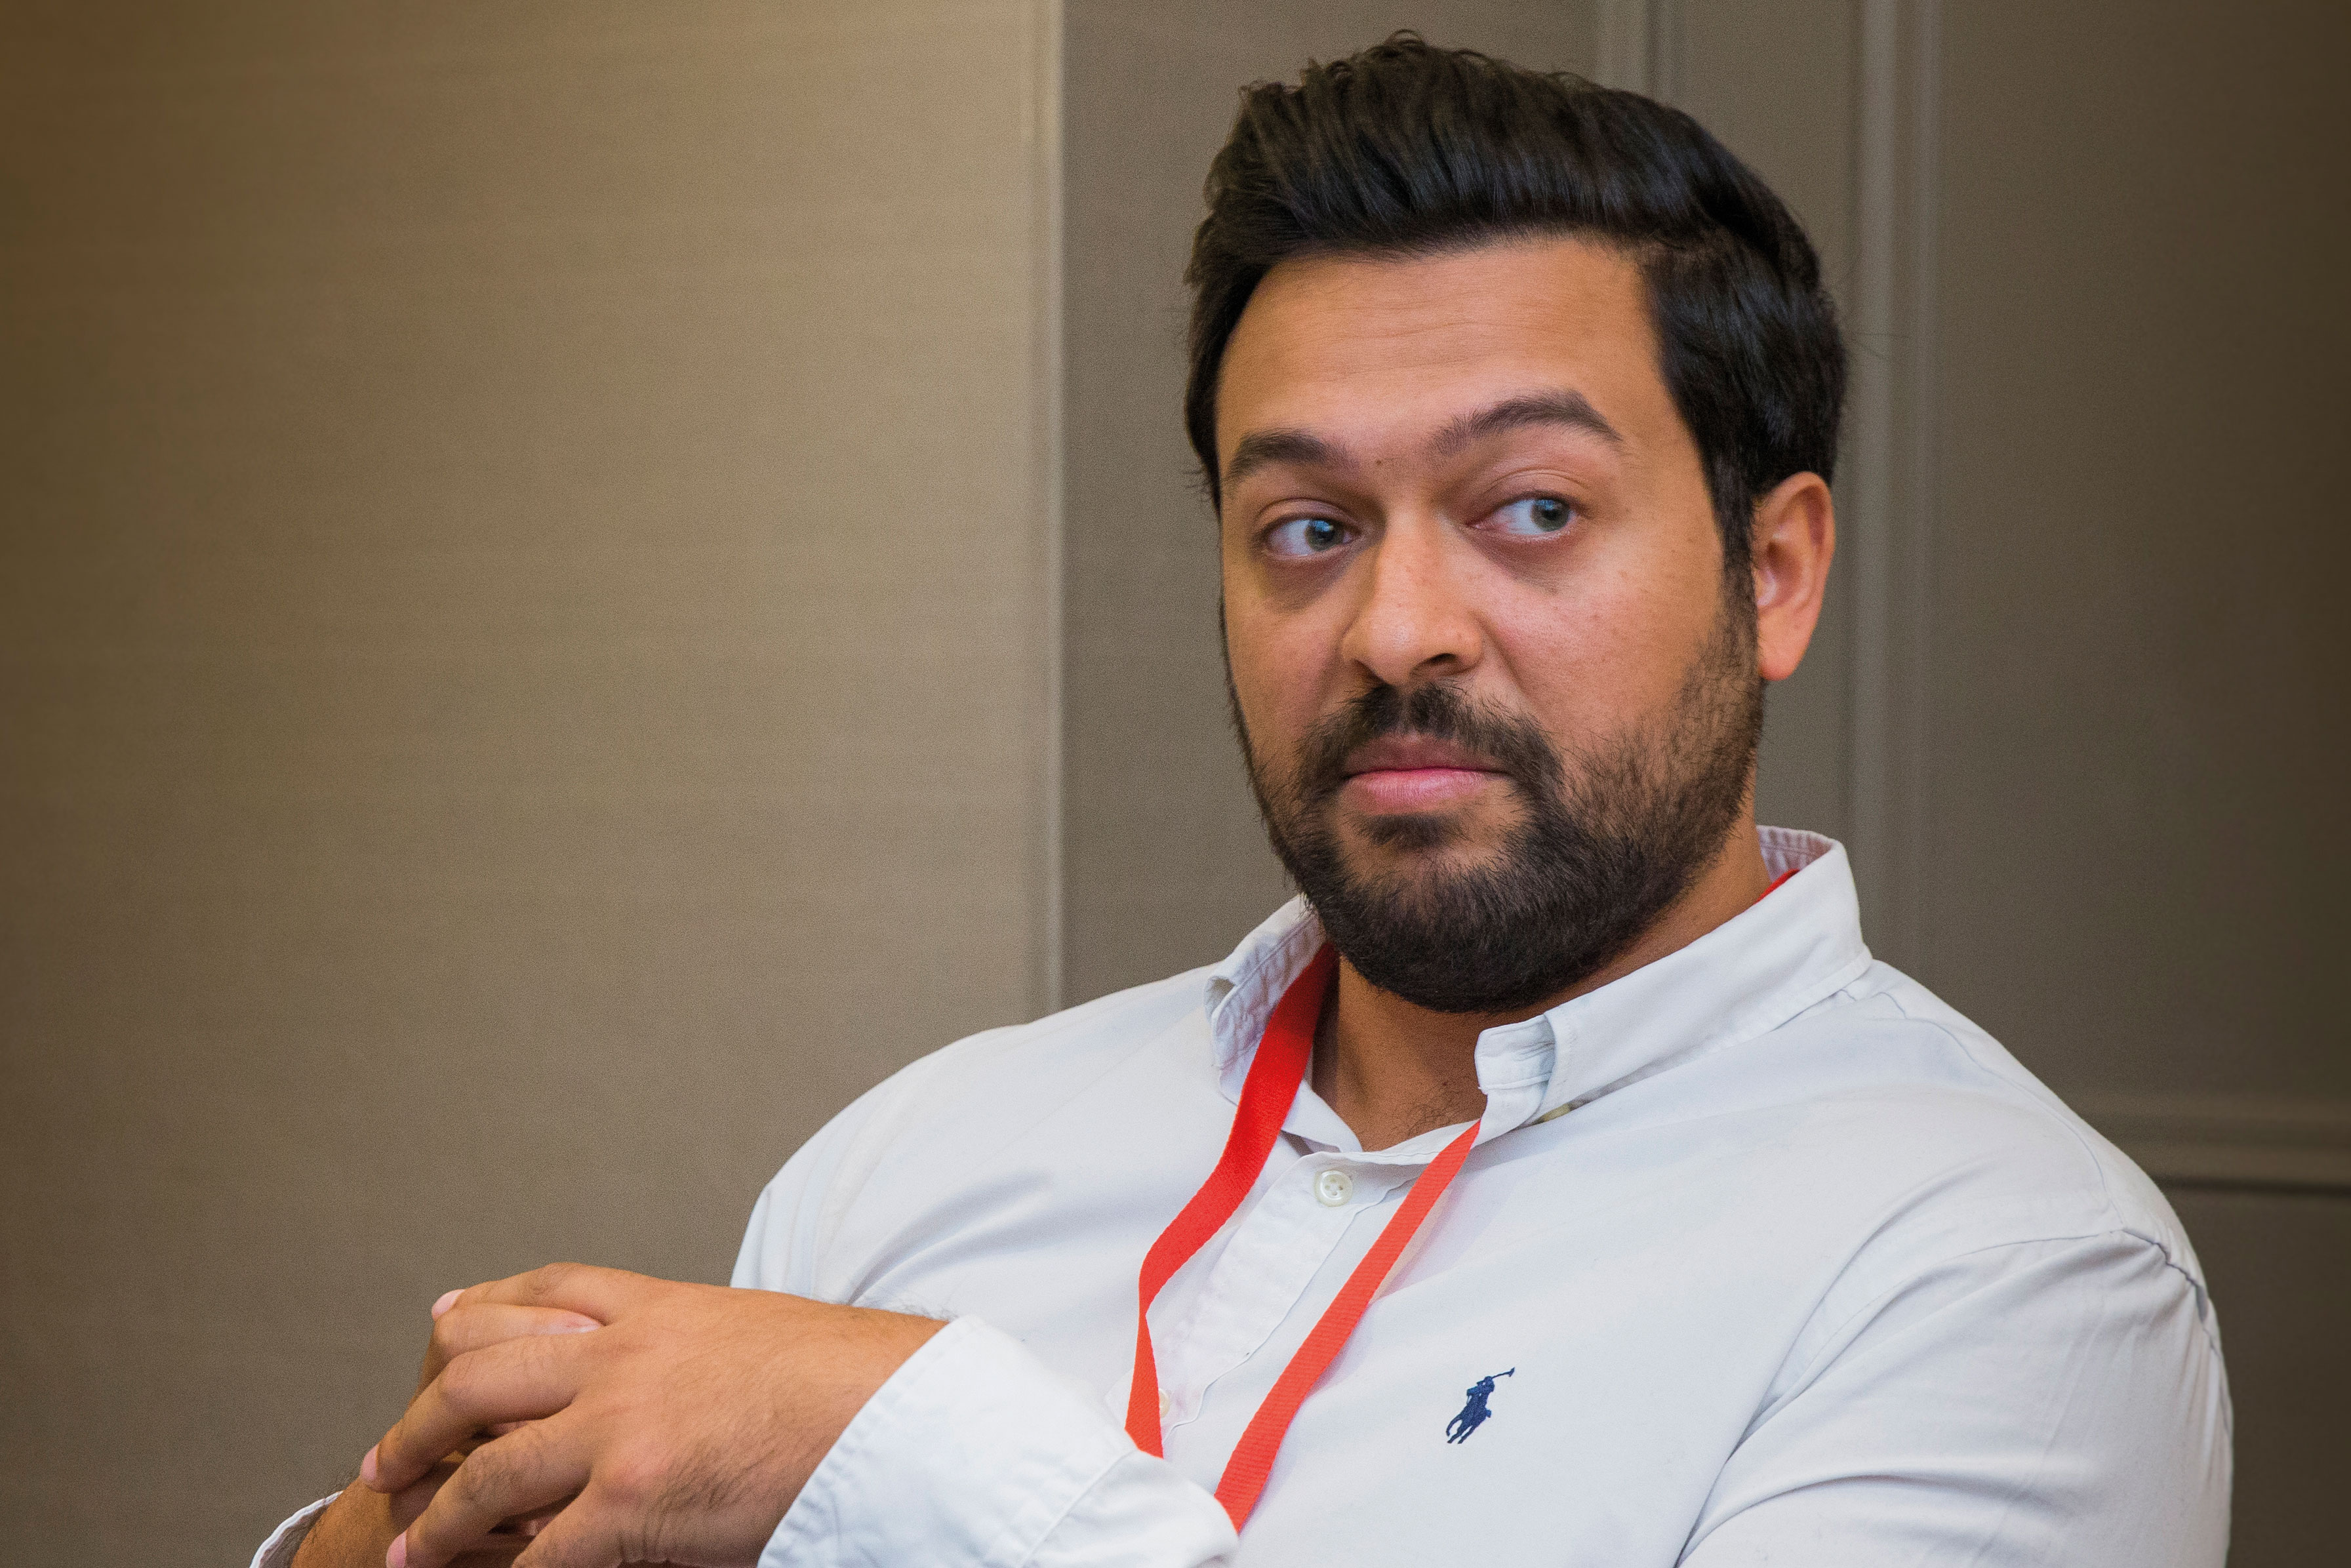 Rav Dhaliwal, head of performance marketing, Marks & Spencer